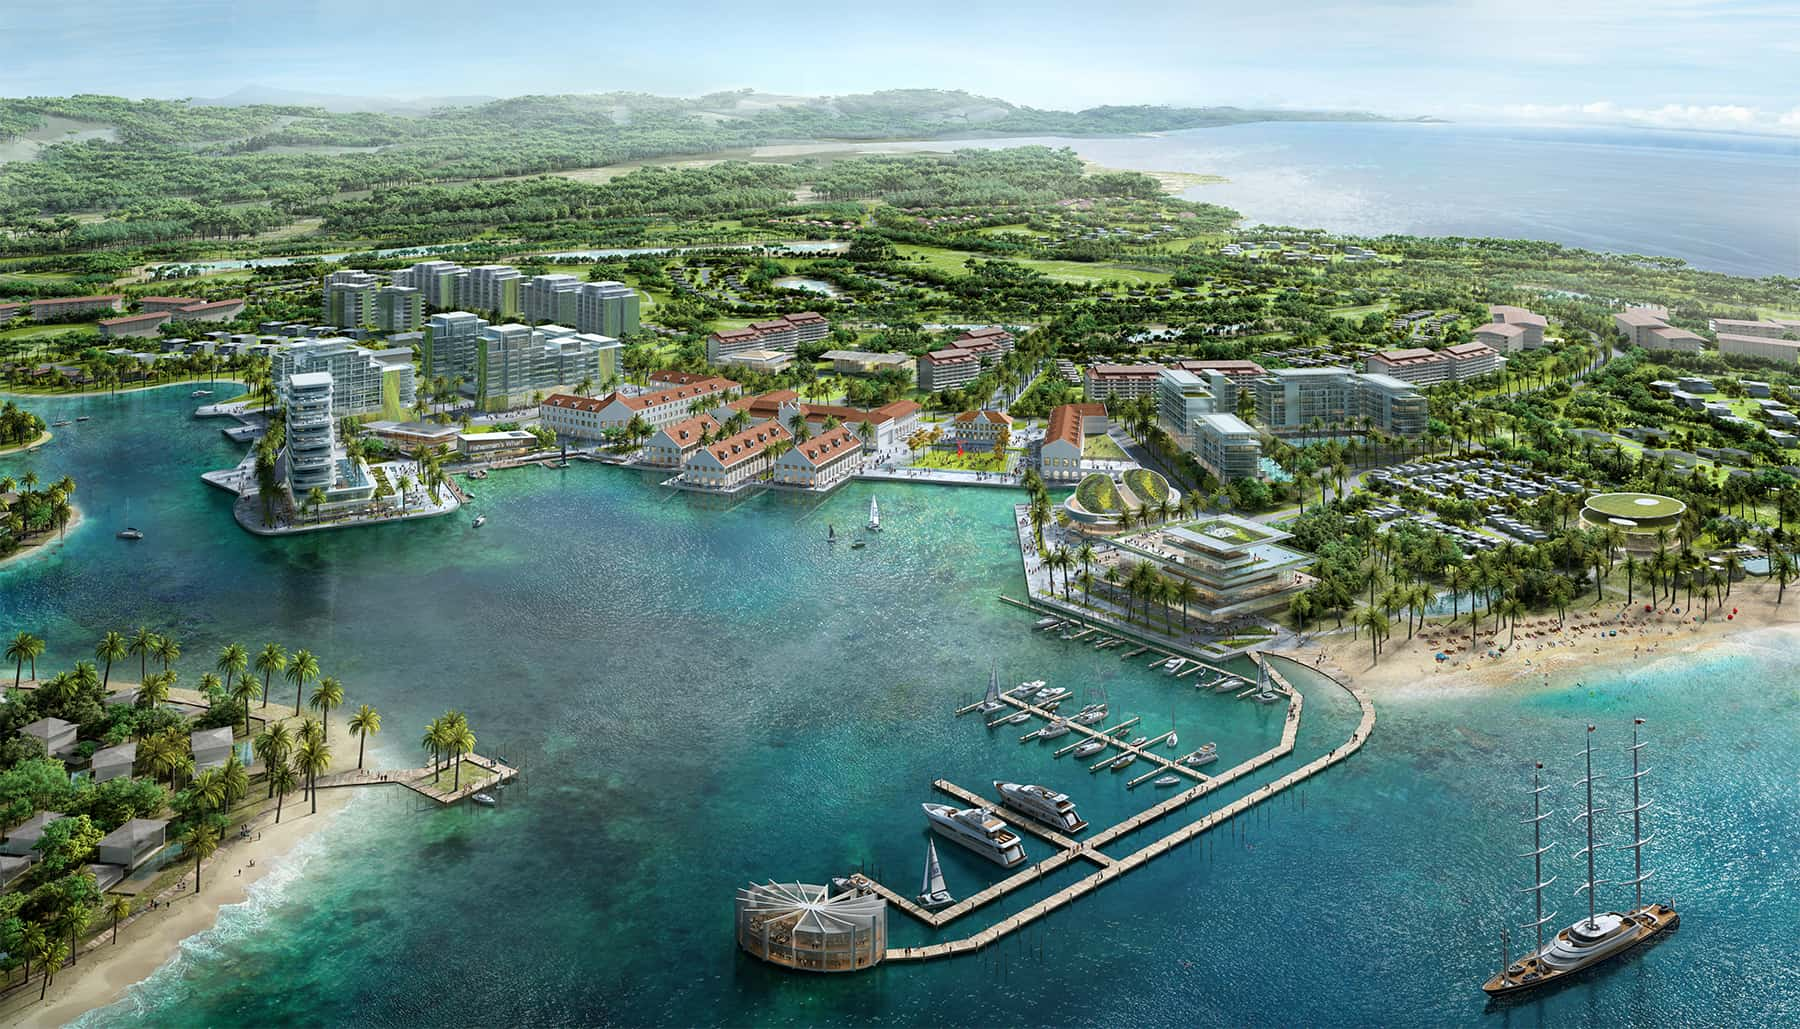 Malaysia • Harbor • Beach • Resort • Hotel